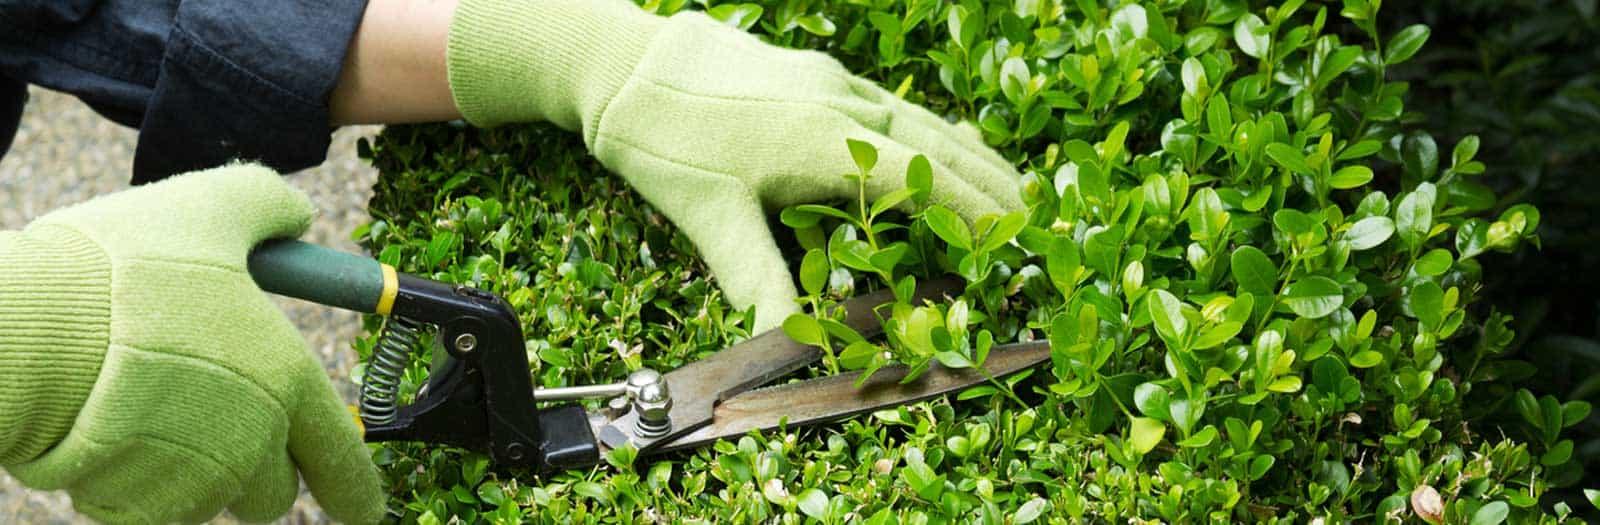 hands pruning healthy shrub